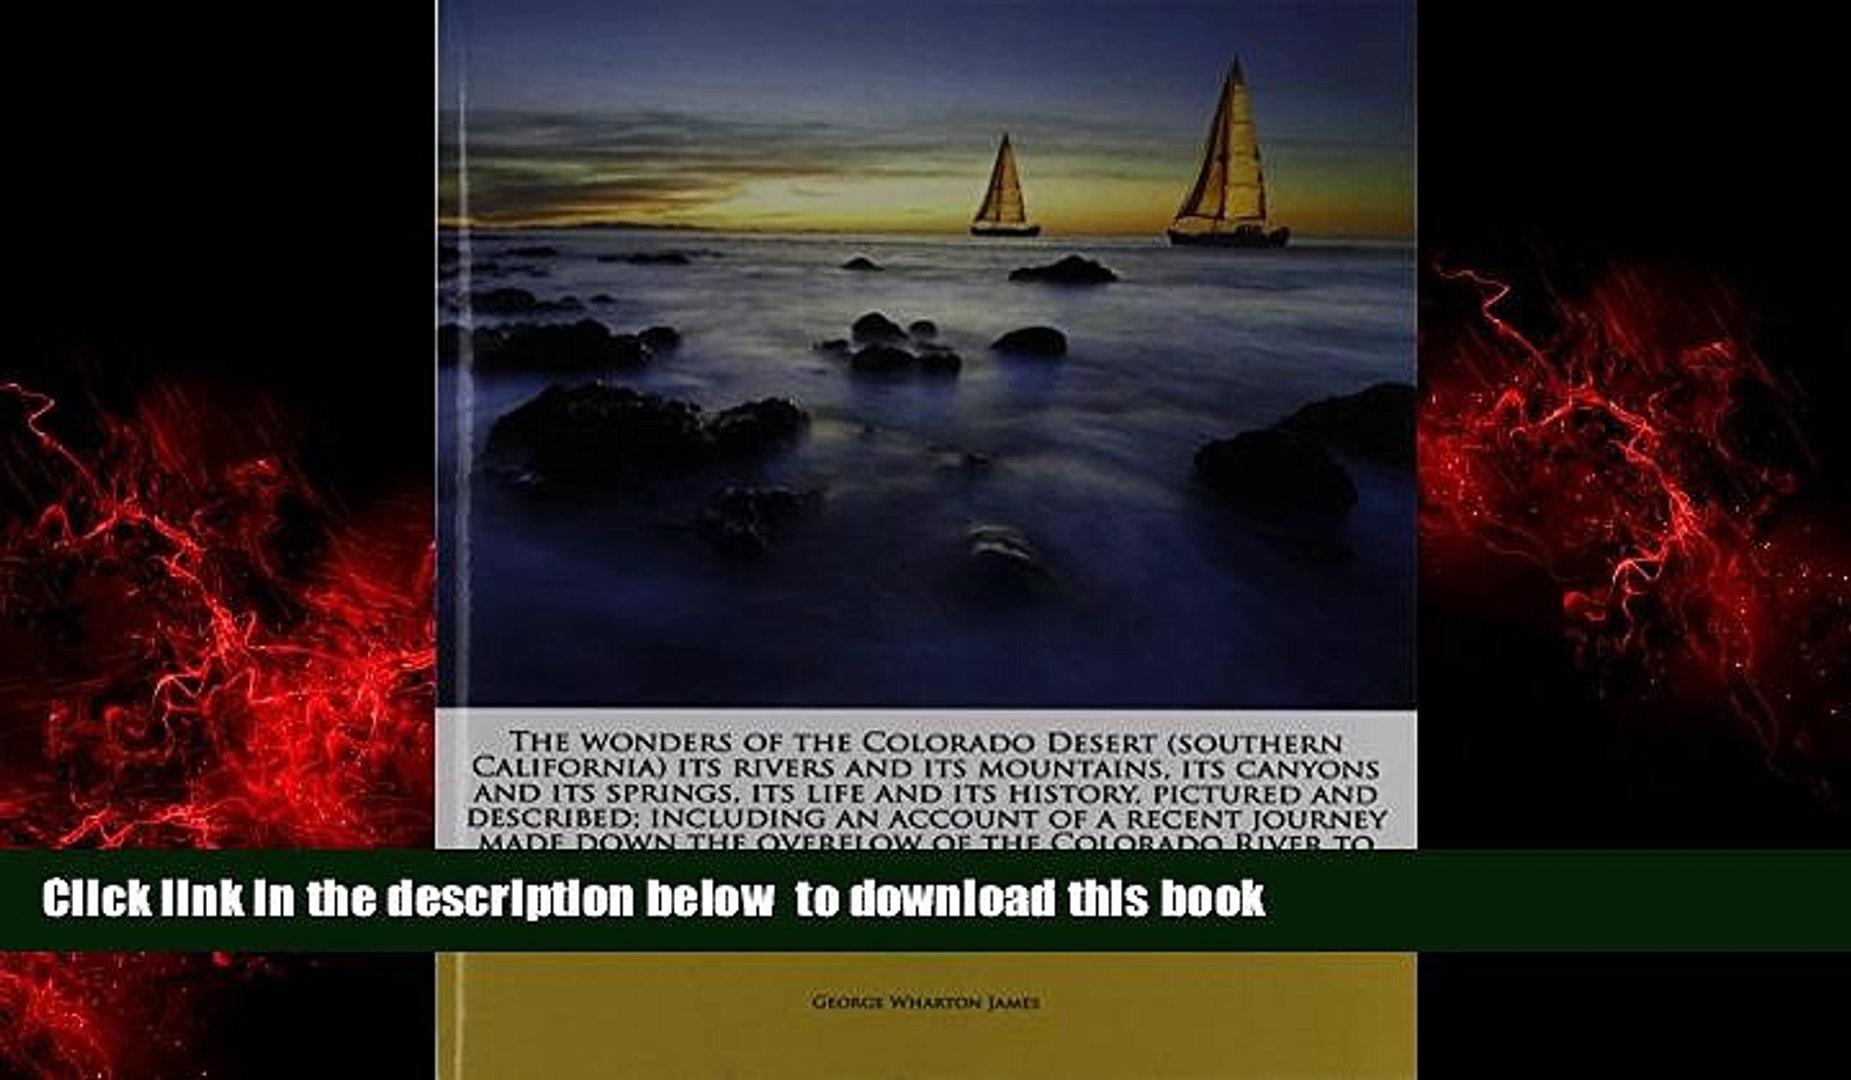 liberty books  The Wonders of the Colorado Desert, Volume II of II BOOOK ONLINE